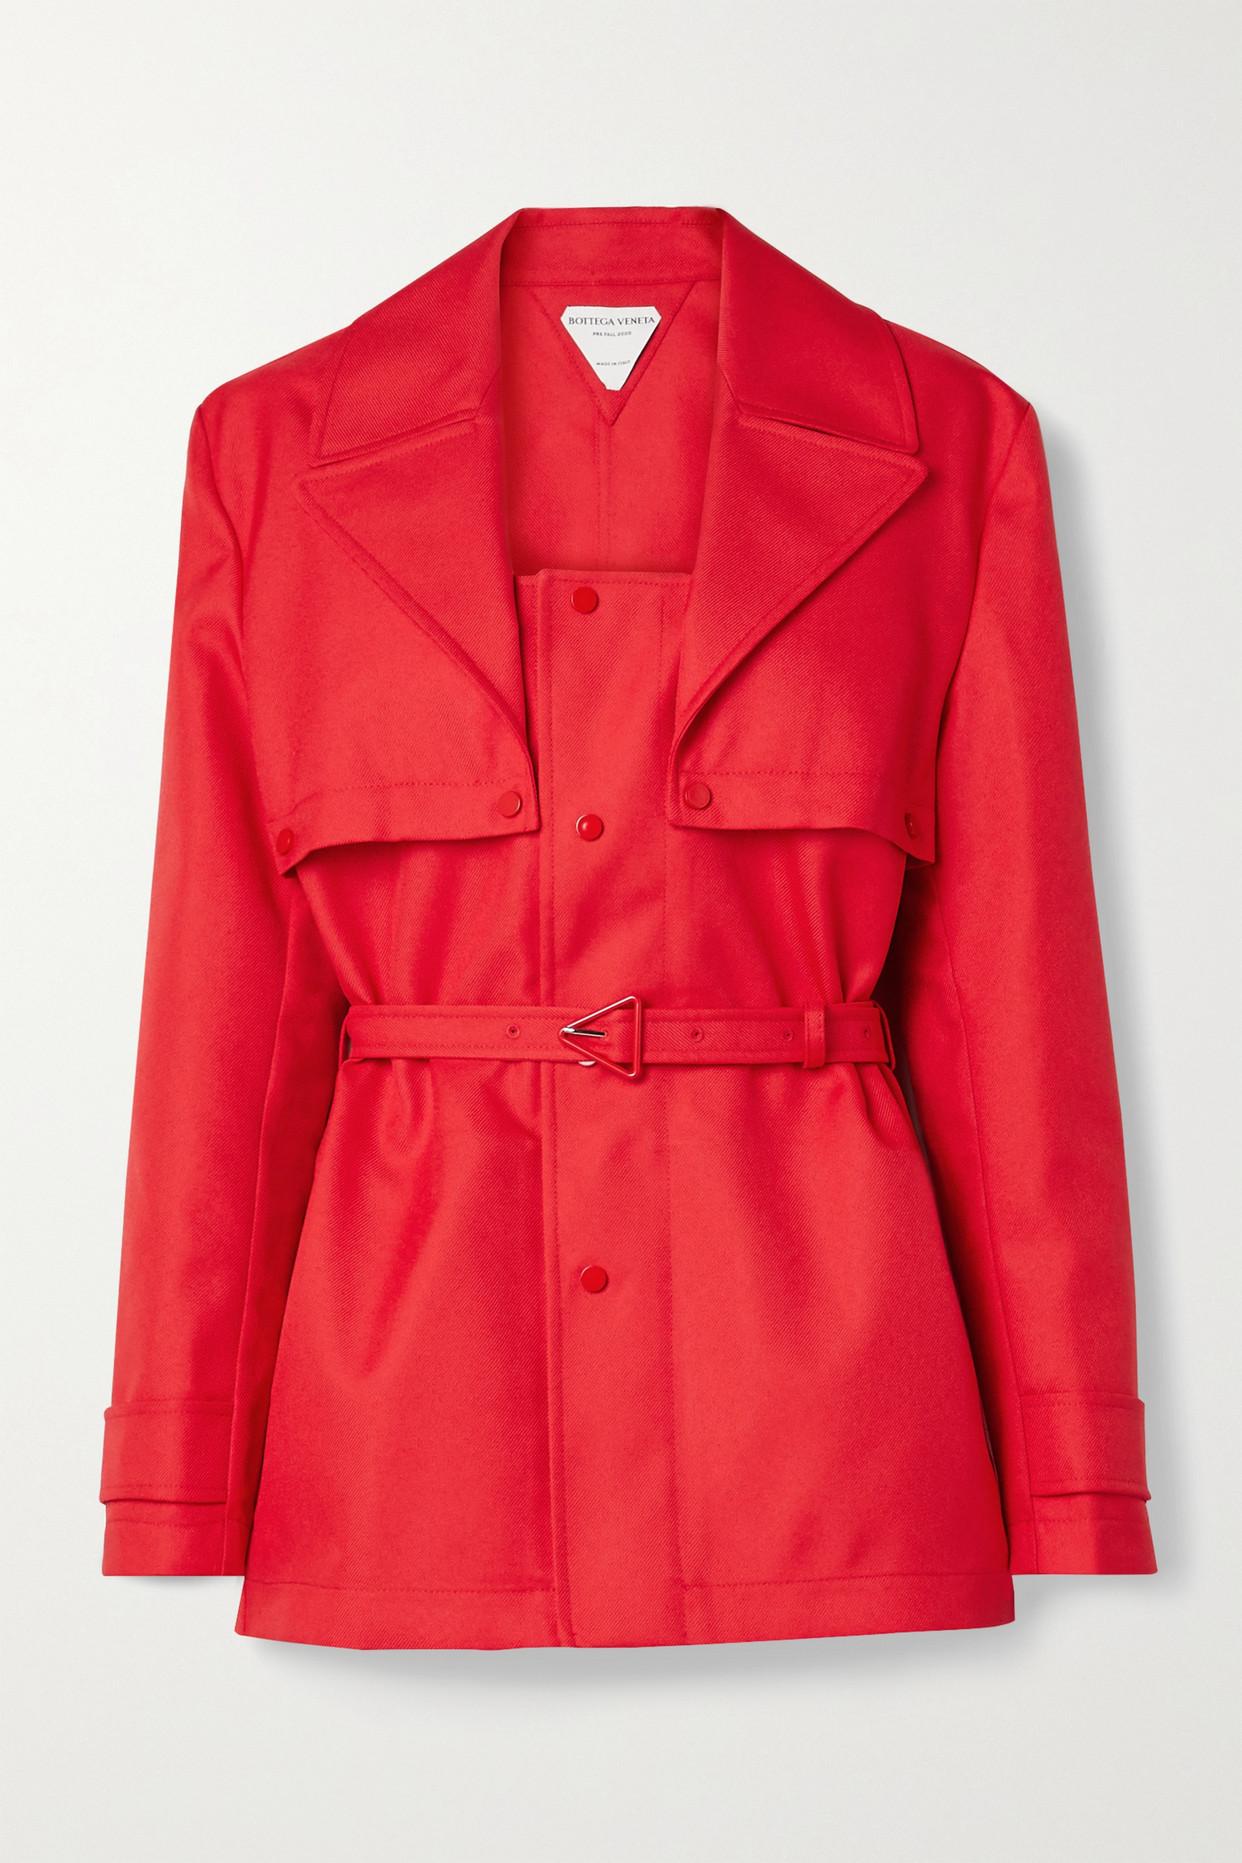 BOTTEGA VENETA - 配腰带斜纹布外套 - 红色 - IT38